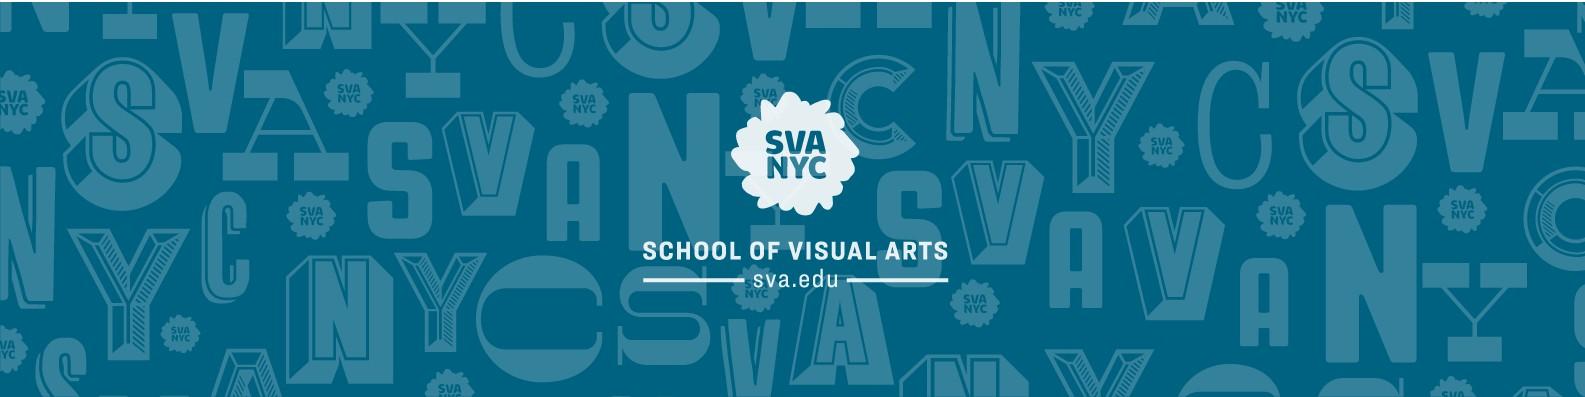 School of Visual Arts   LinkedIn